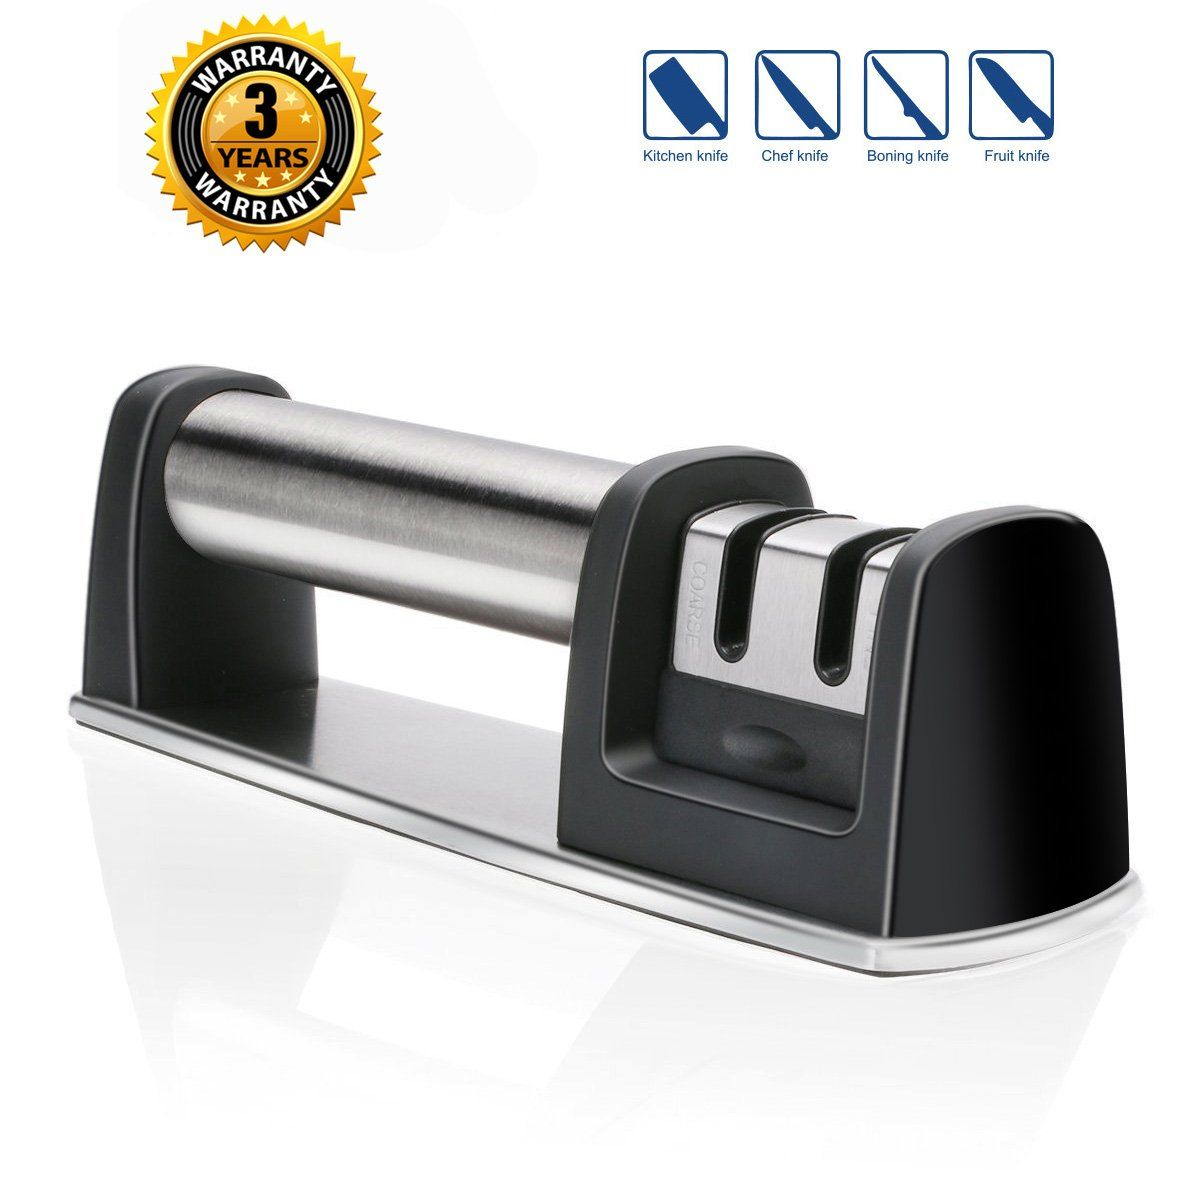 Serrated Knife Sharpener Knife Sharpening Steel System Kitchen New Kitchen Knife Sharpening Inspiration